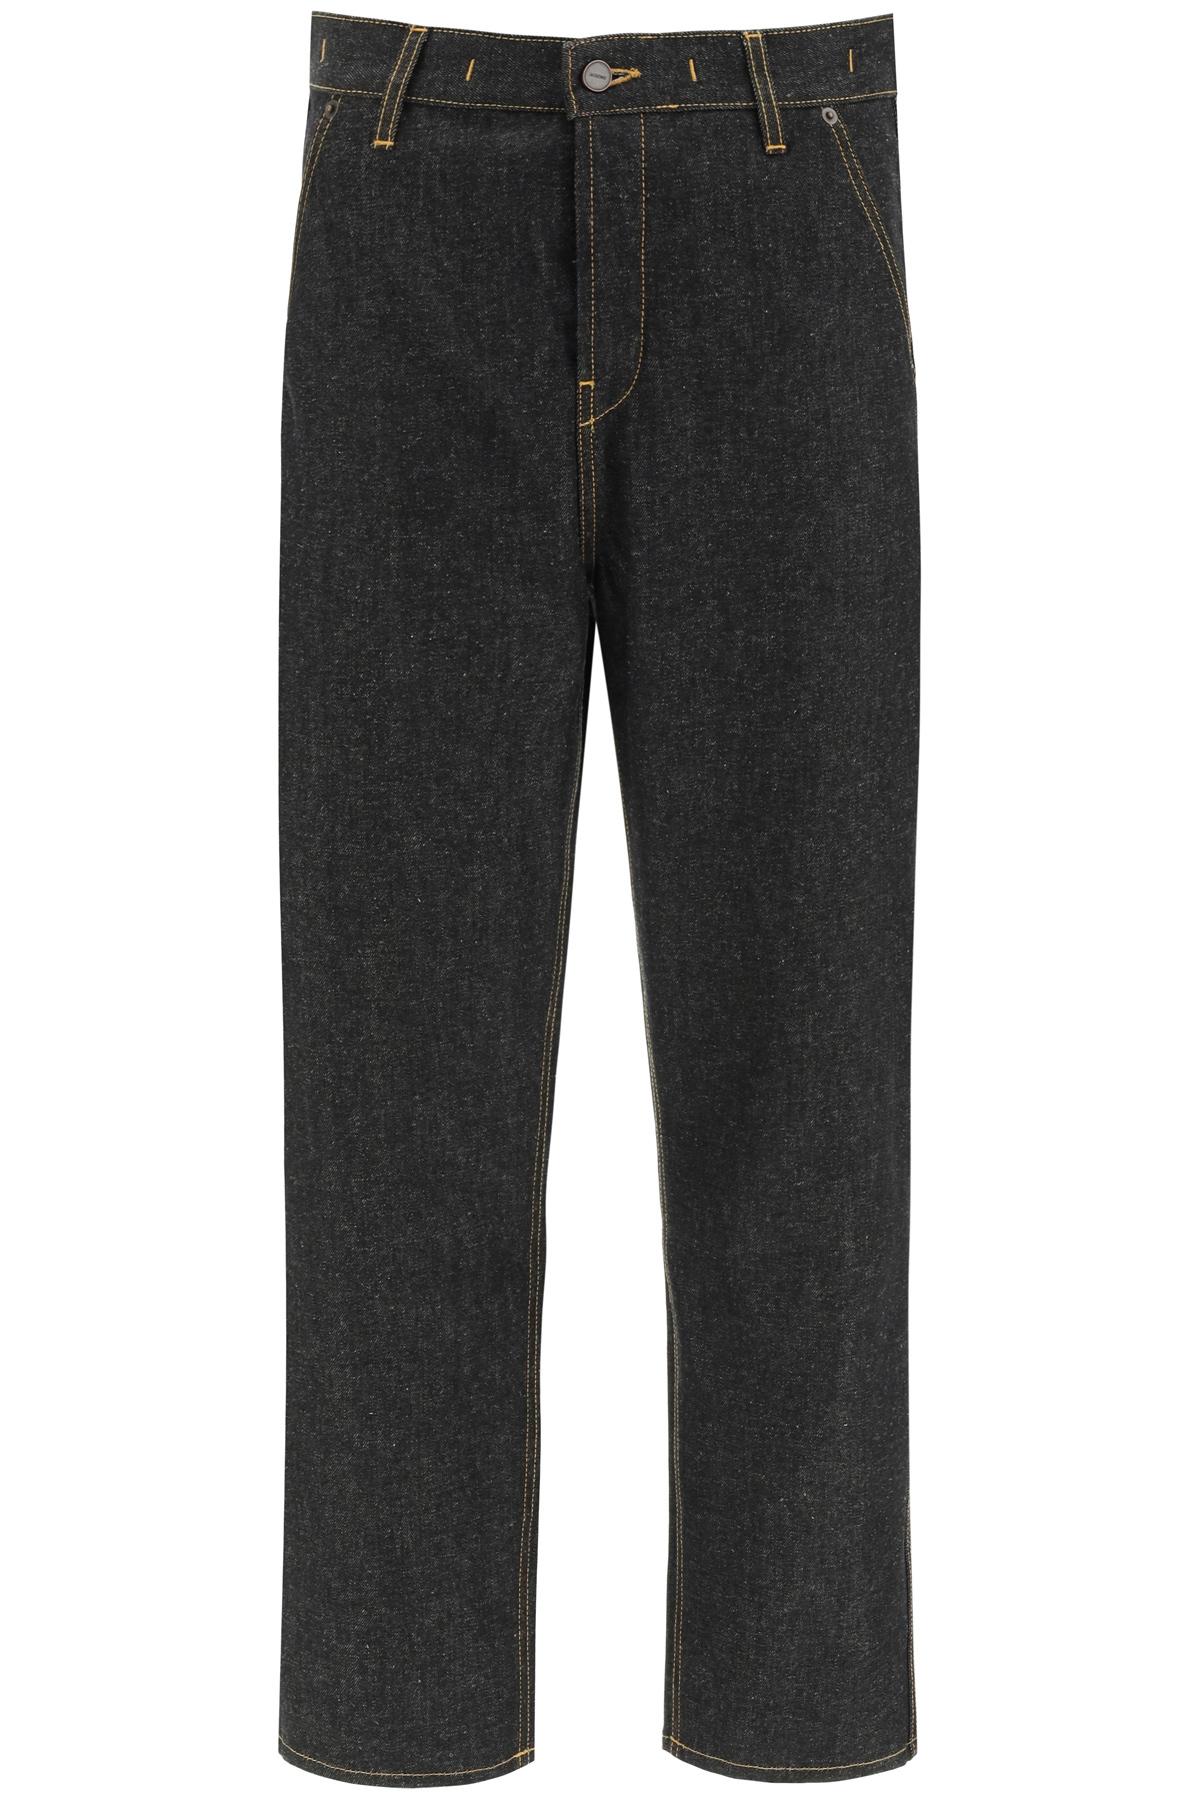 Jacquemus jeans in denime